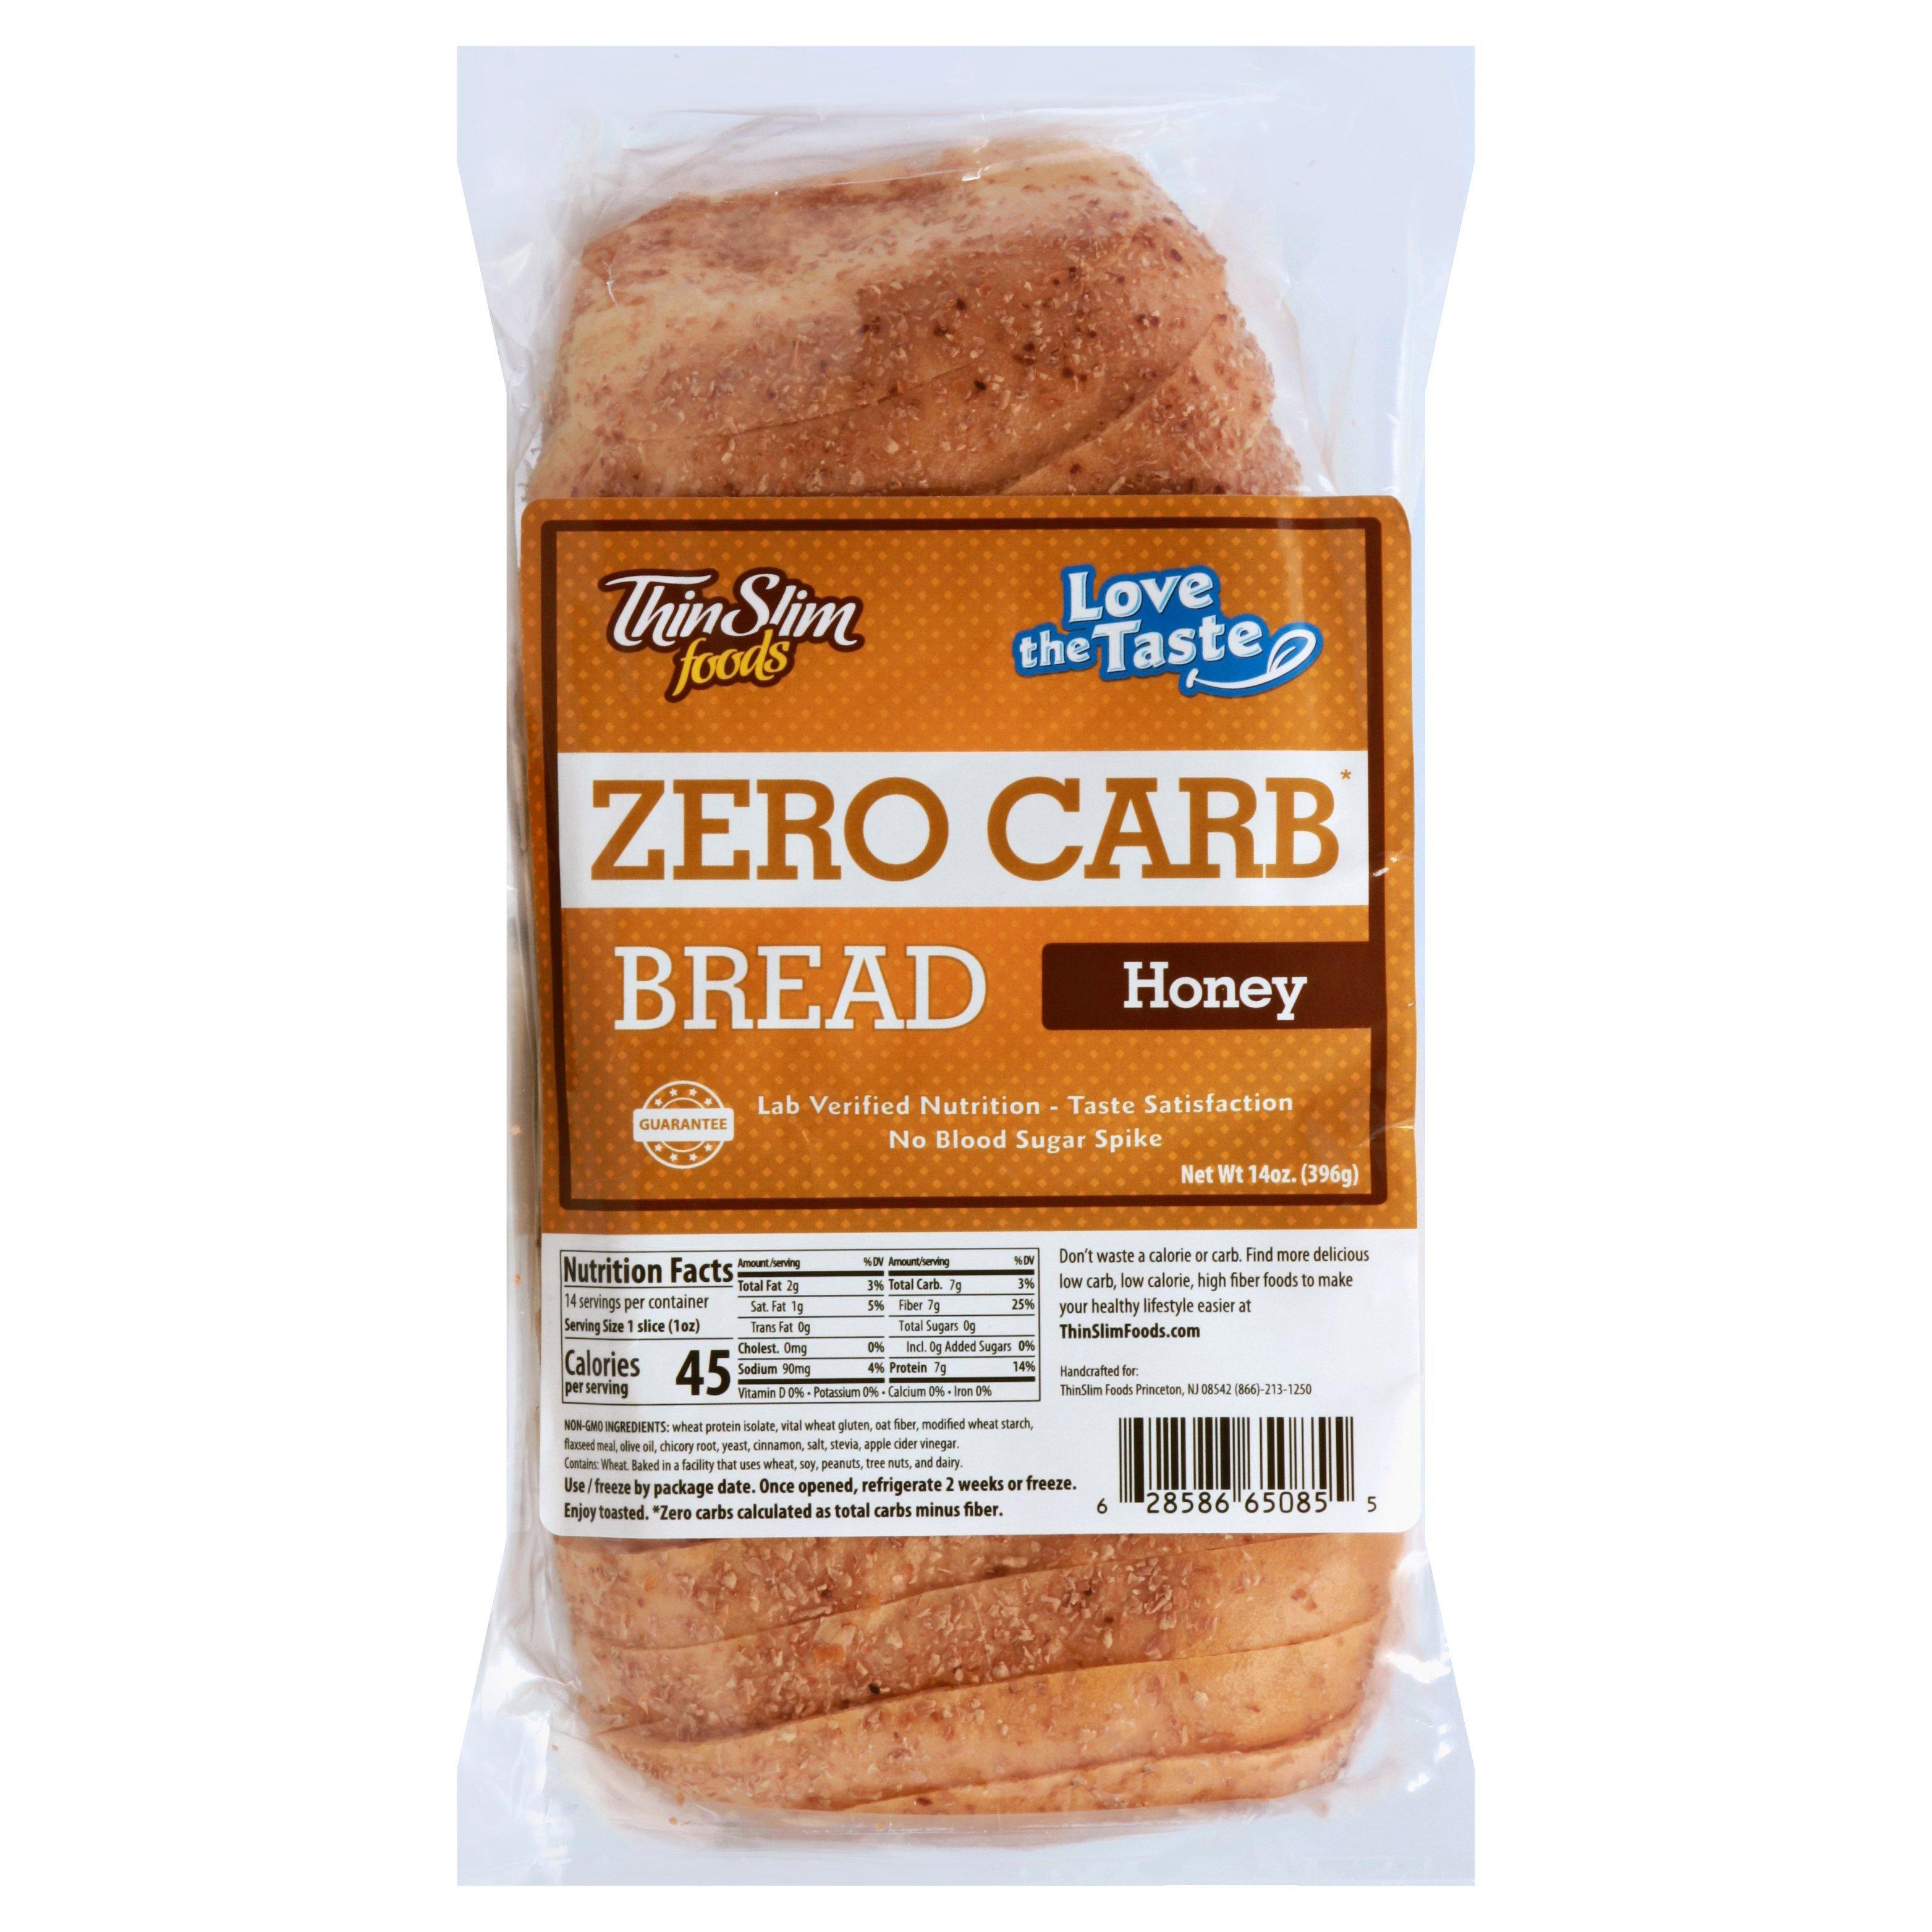 Thin Slim Foods Honey Zero Carb Bread Shop Bread At H E B